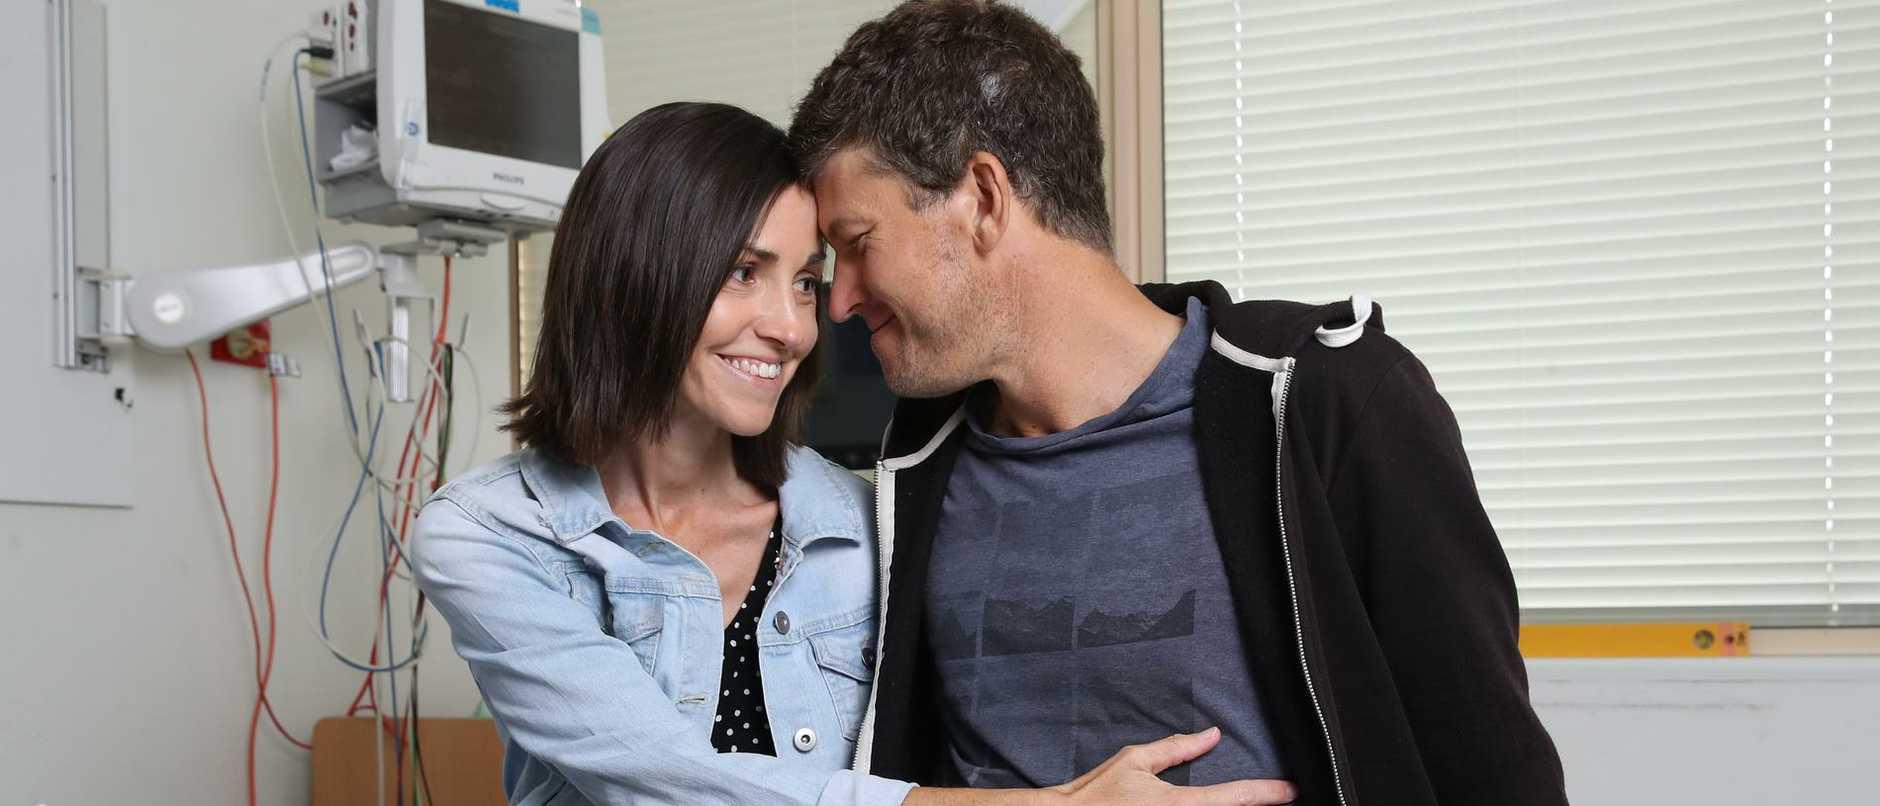 Xmas: Wife Donates Kidney to Husband